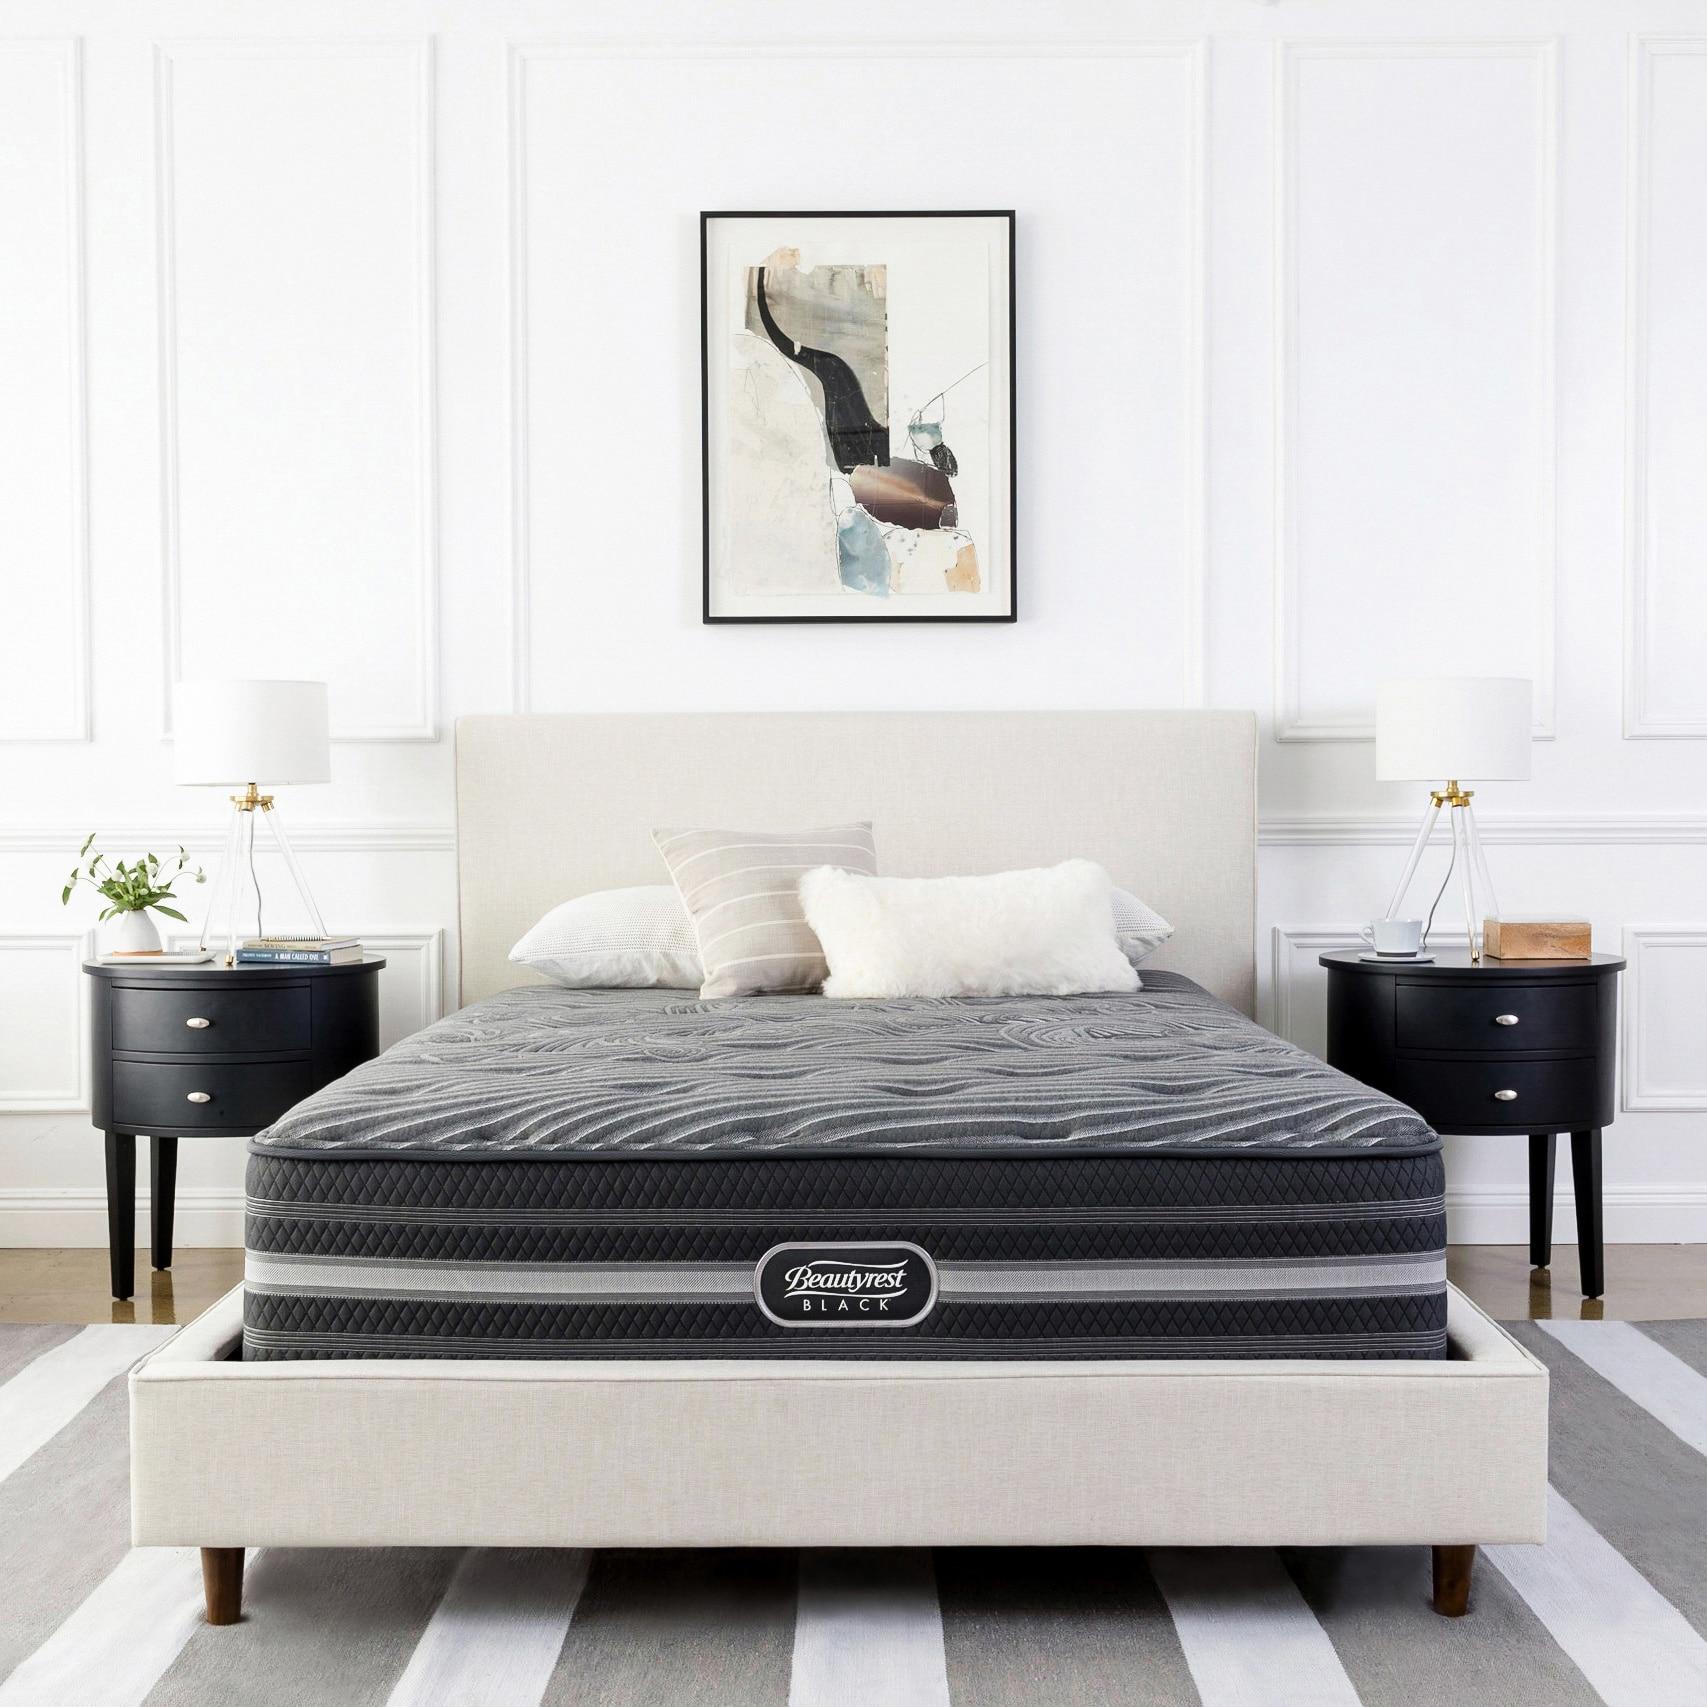 Beautyrest Black Mariela 14-inch Extra Firm California Ki...